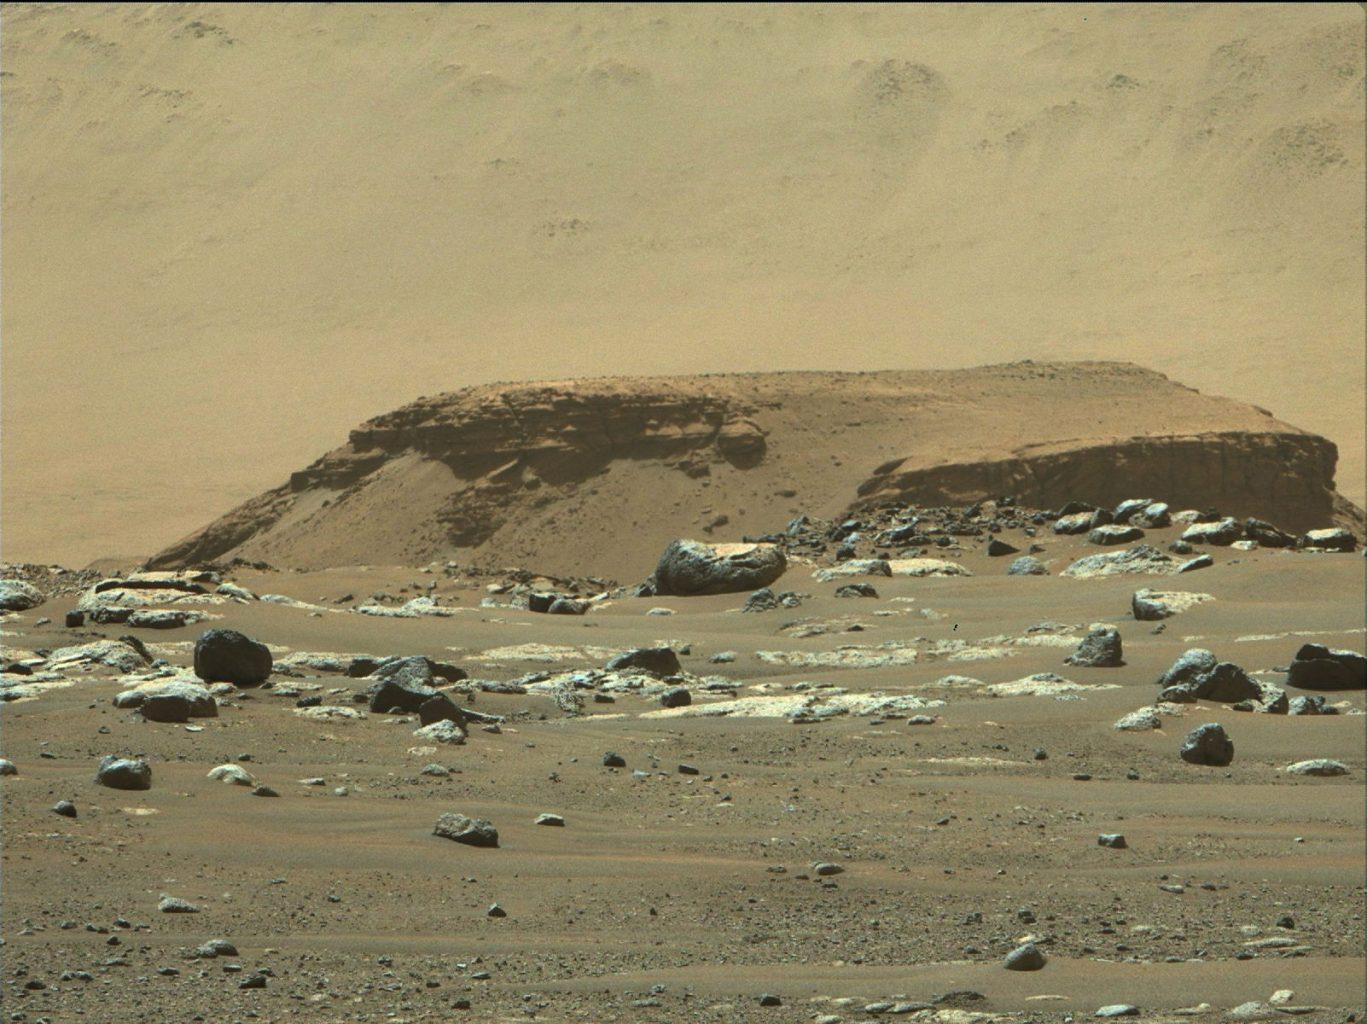 Image of the stacked sediment layer deposits known as Kodiak. Credit: NASA/JPL-Caltech/ASU/MSSS